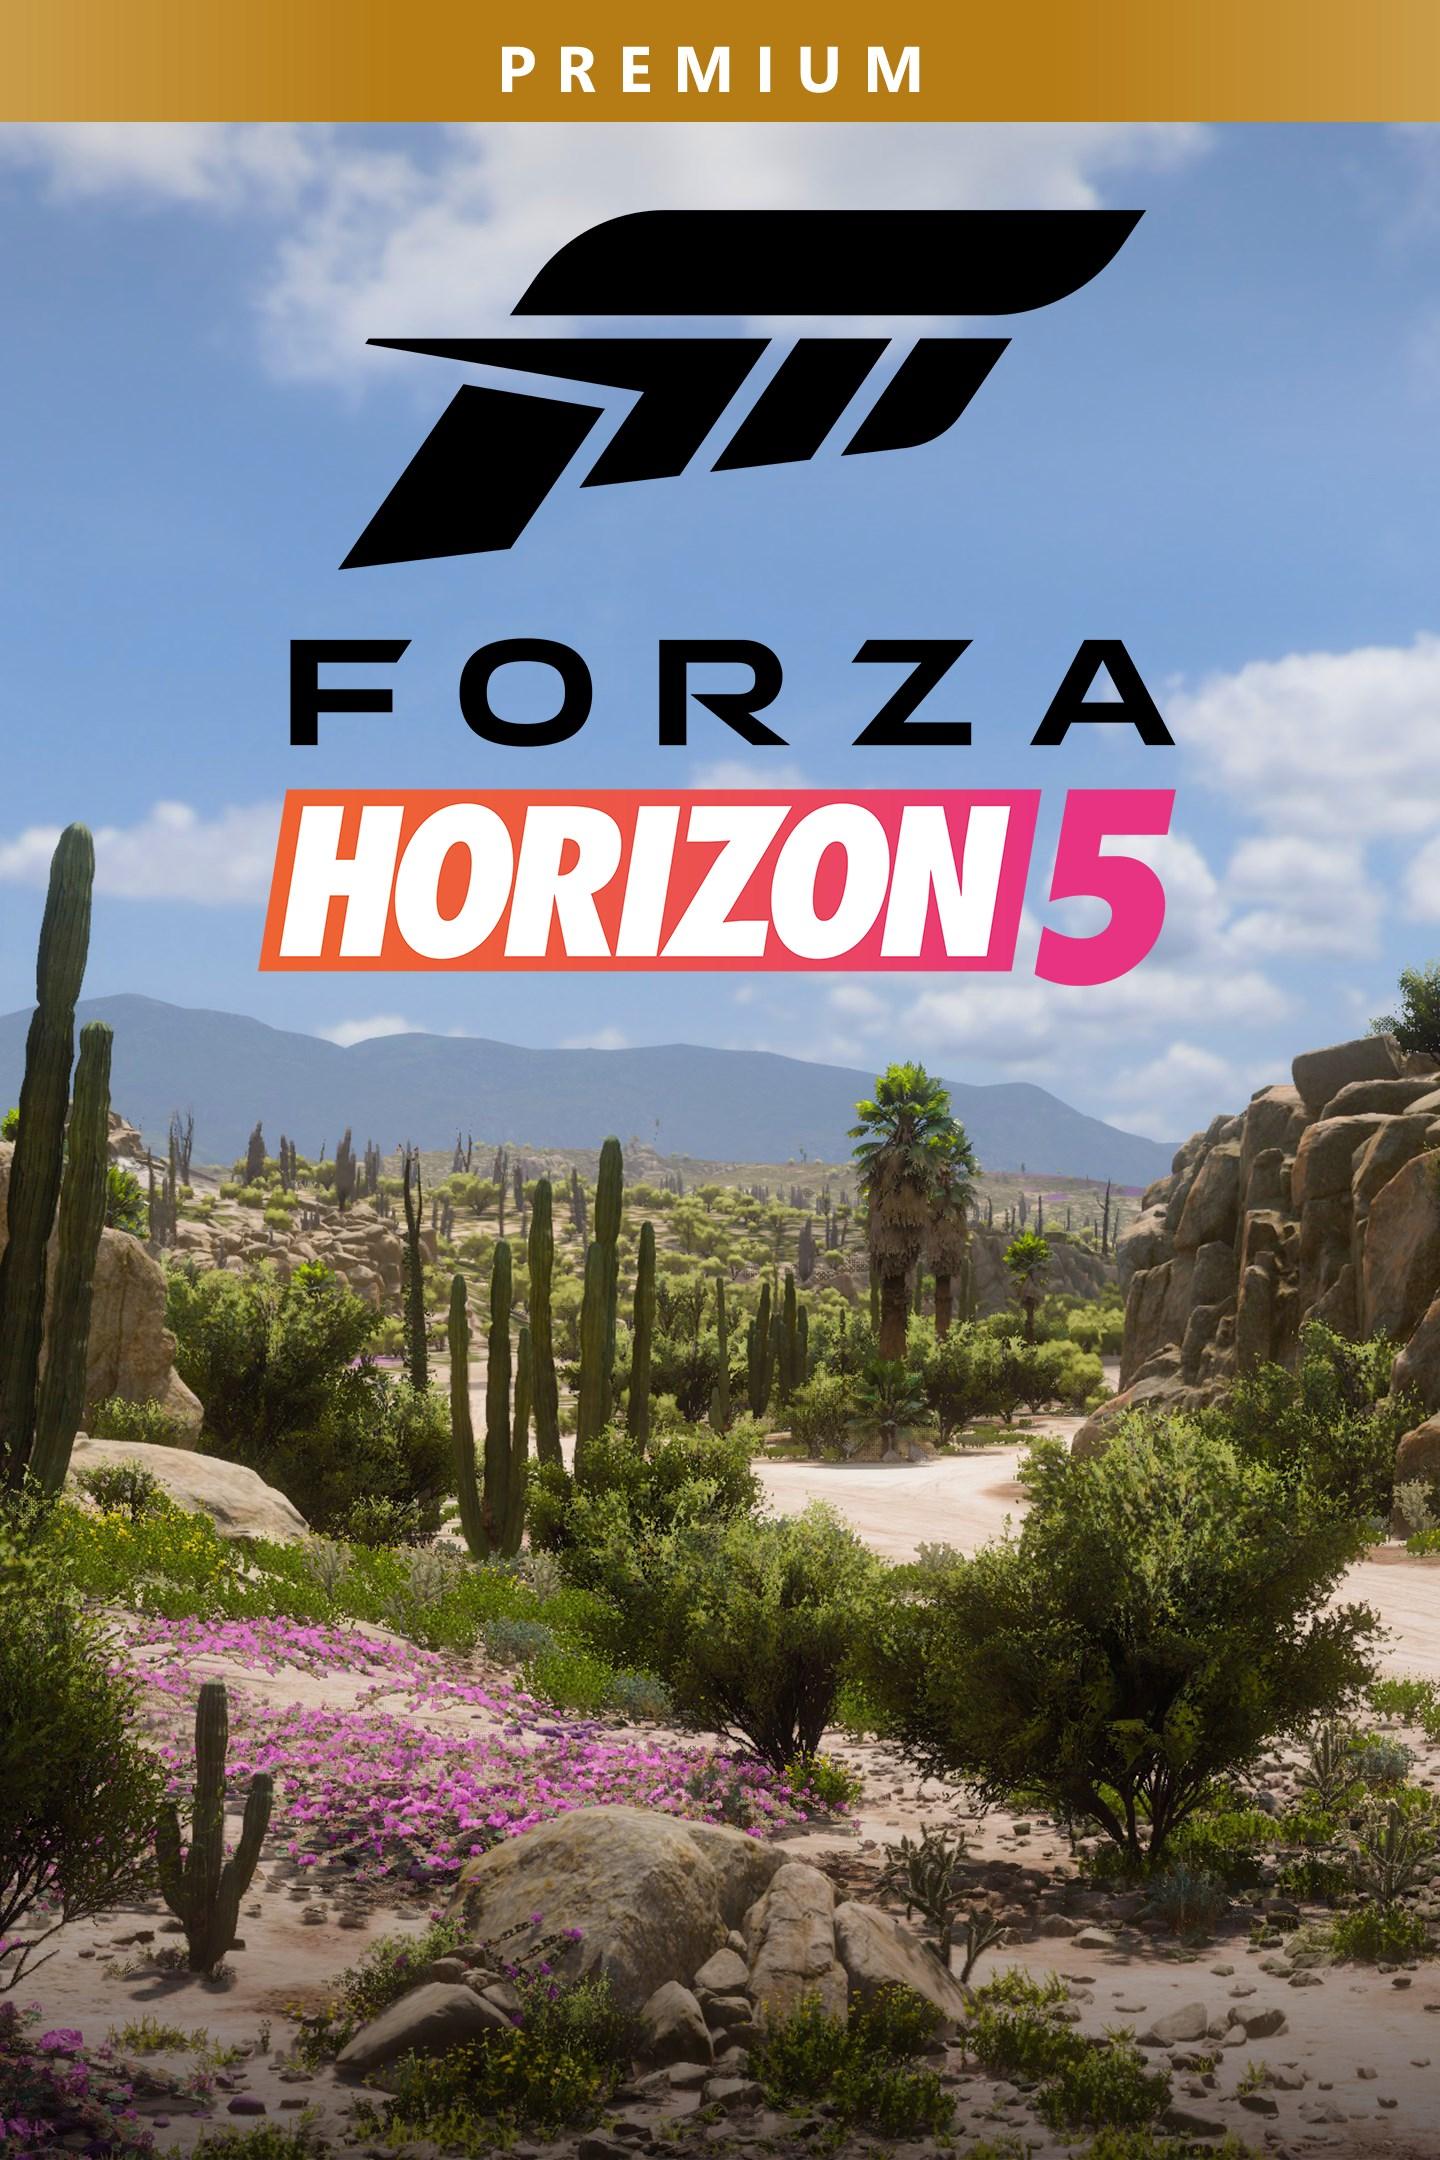 Forza Horizon 5 Premium Edition box shot